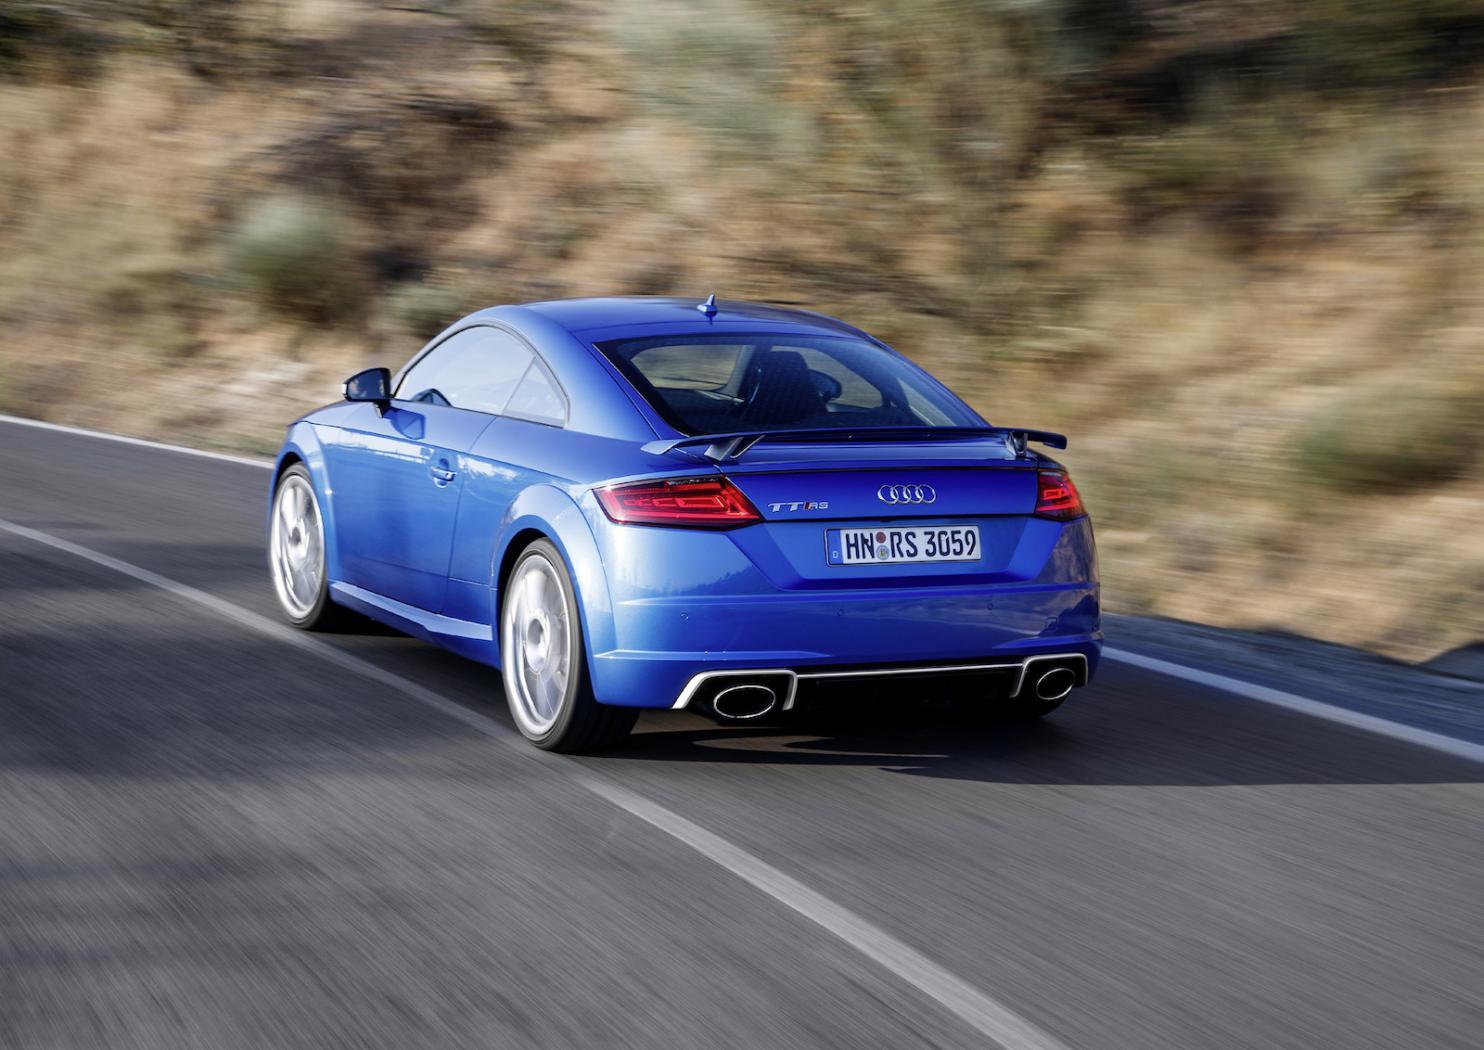 Audi-TT-RS-MK2-Disques-voiles-5.jpeg